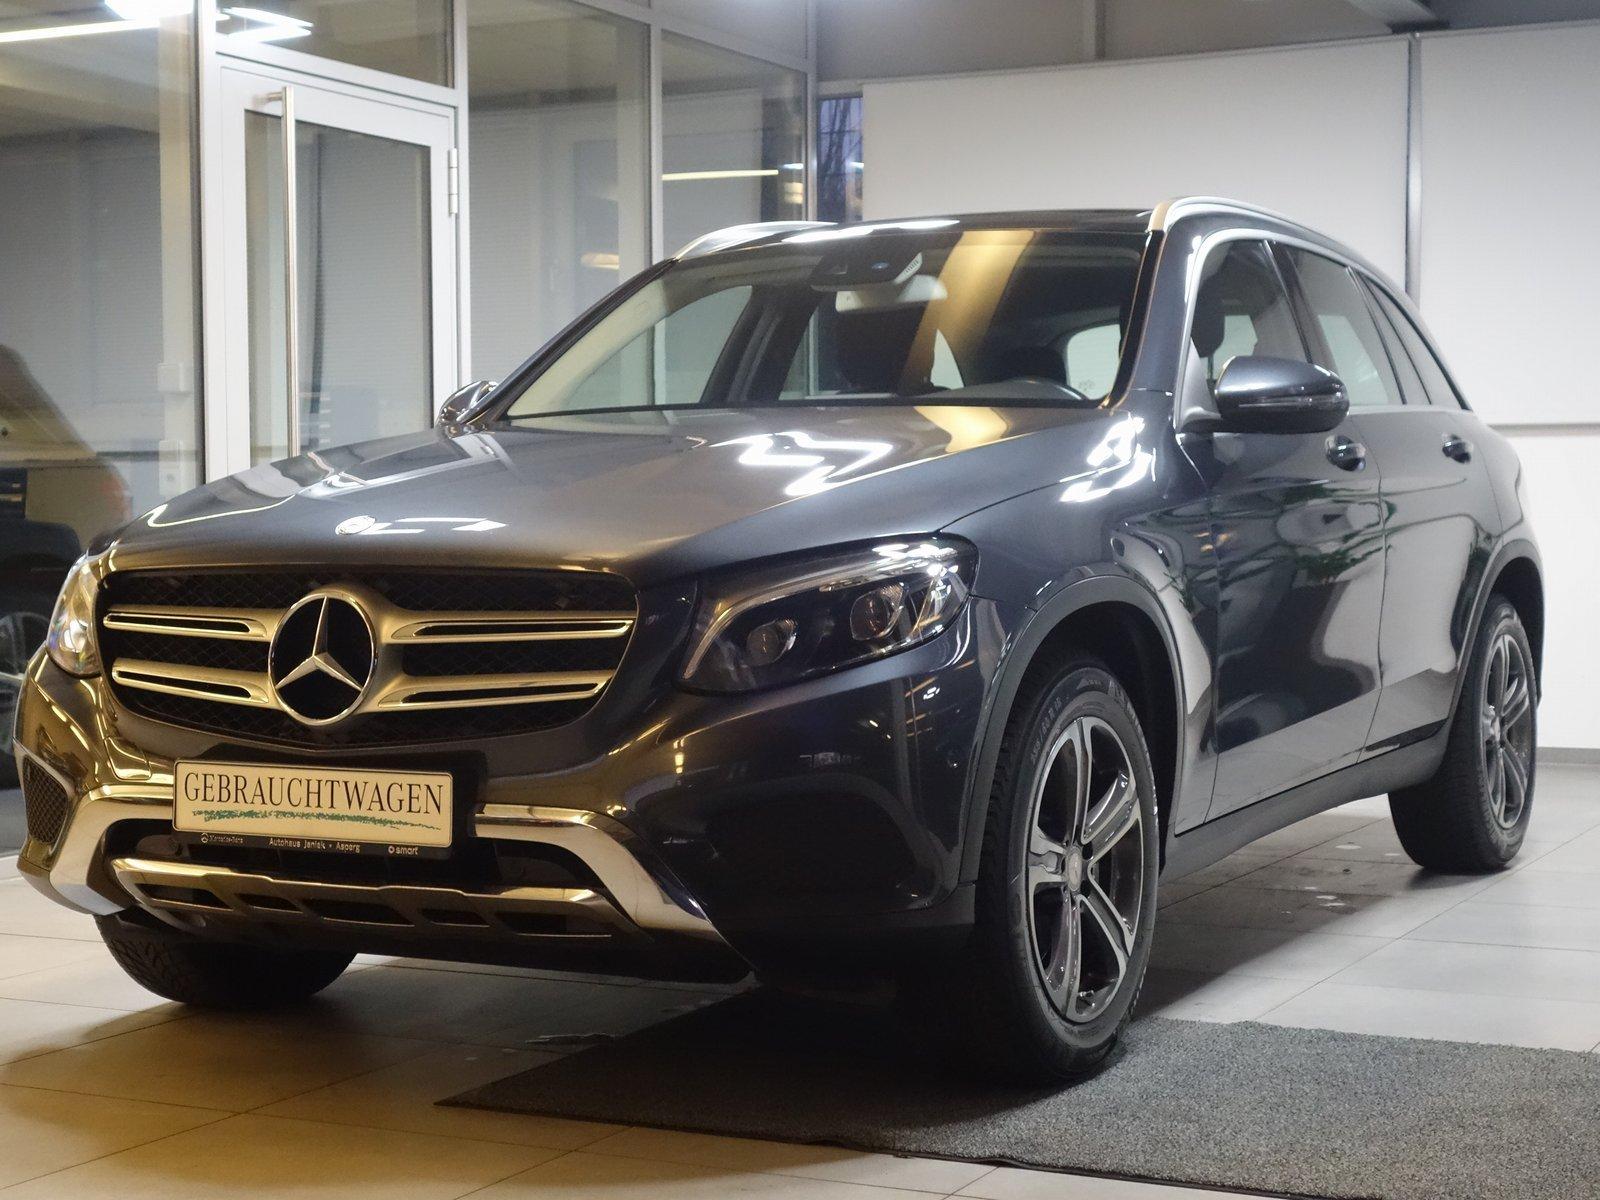 Mercedes-Benz GLC 220d 4M Off-Road|AHK|LED|Panorama|Kamera|PDC, Jahr 2015, Diesel